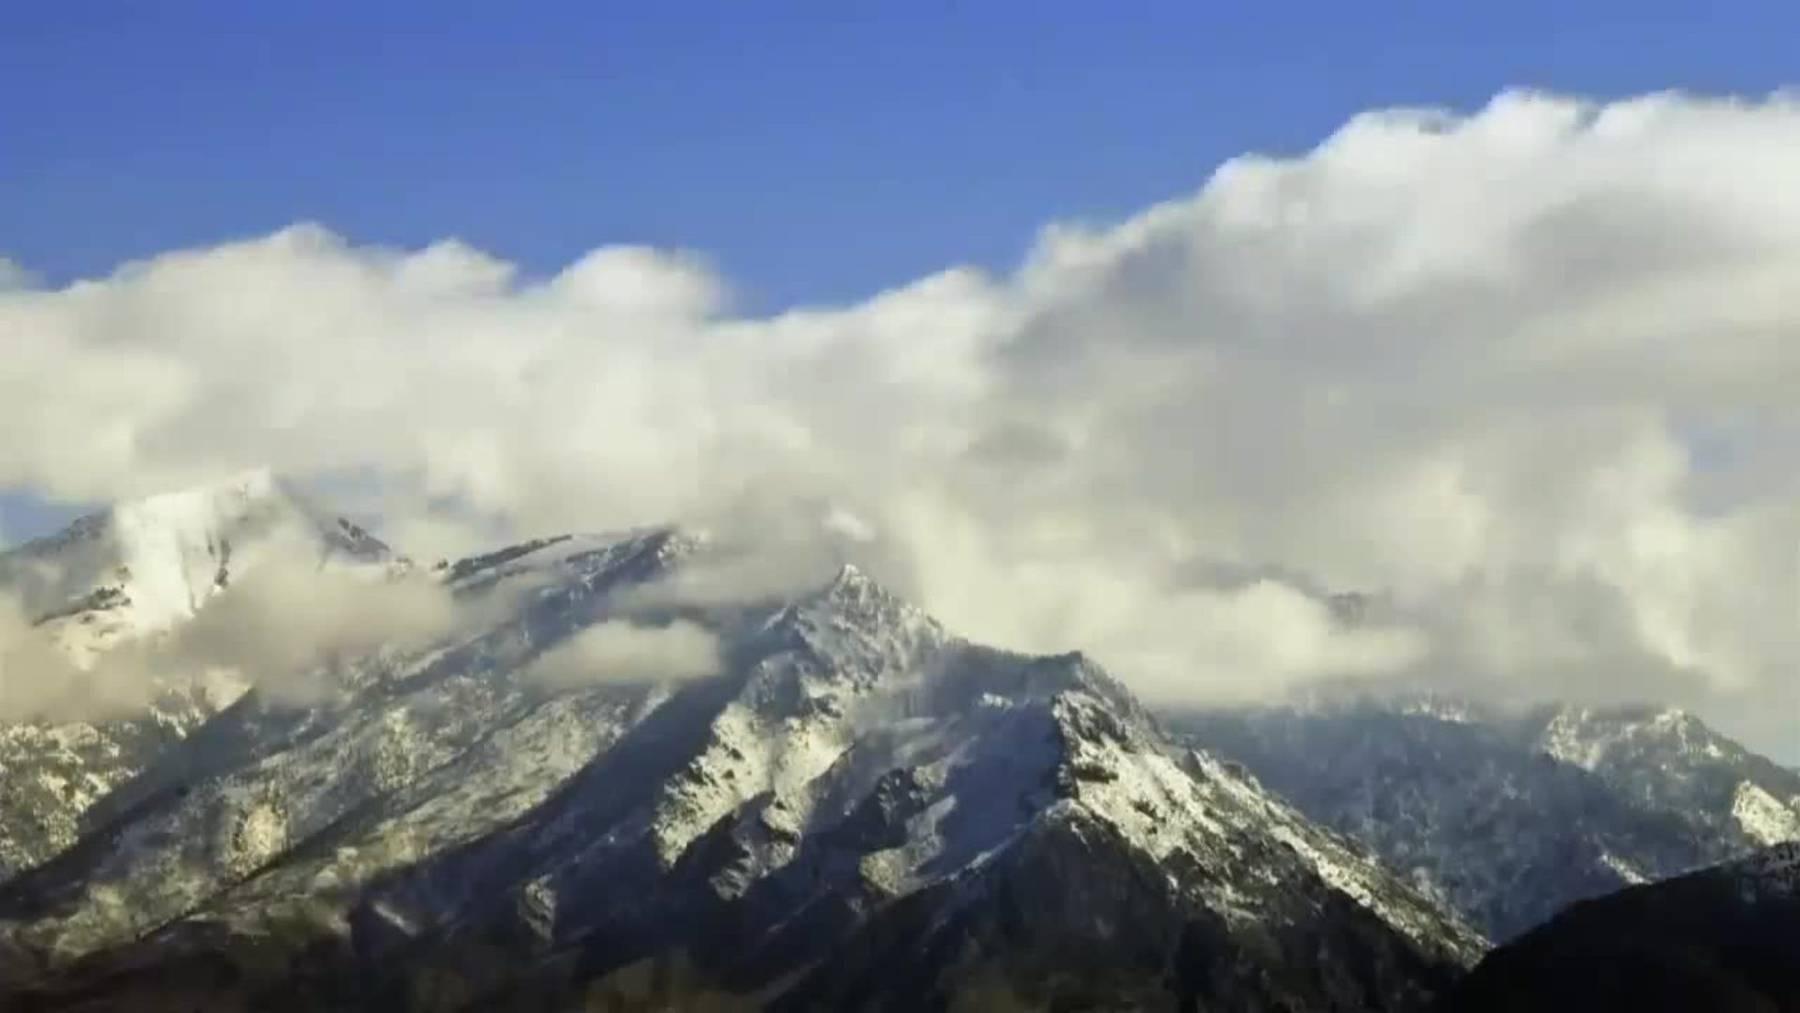 Thumb for ‹Catchup Mountain Life S2 E7 Zu Fuss zur Piste KW09›